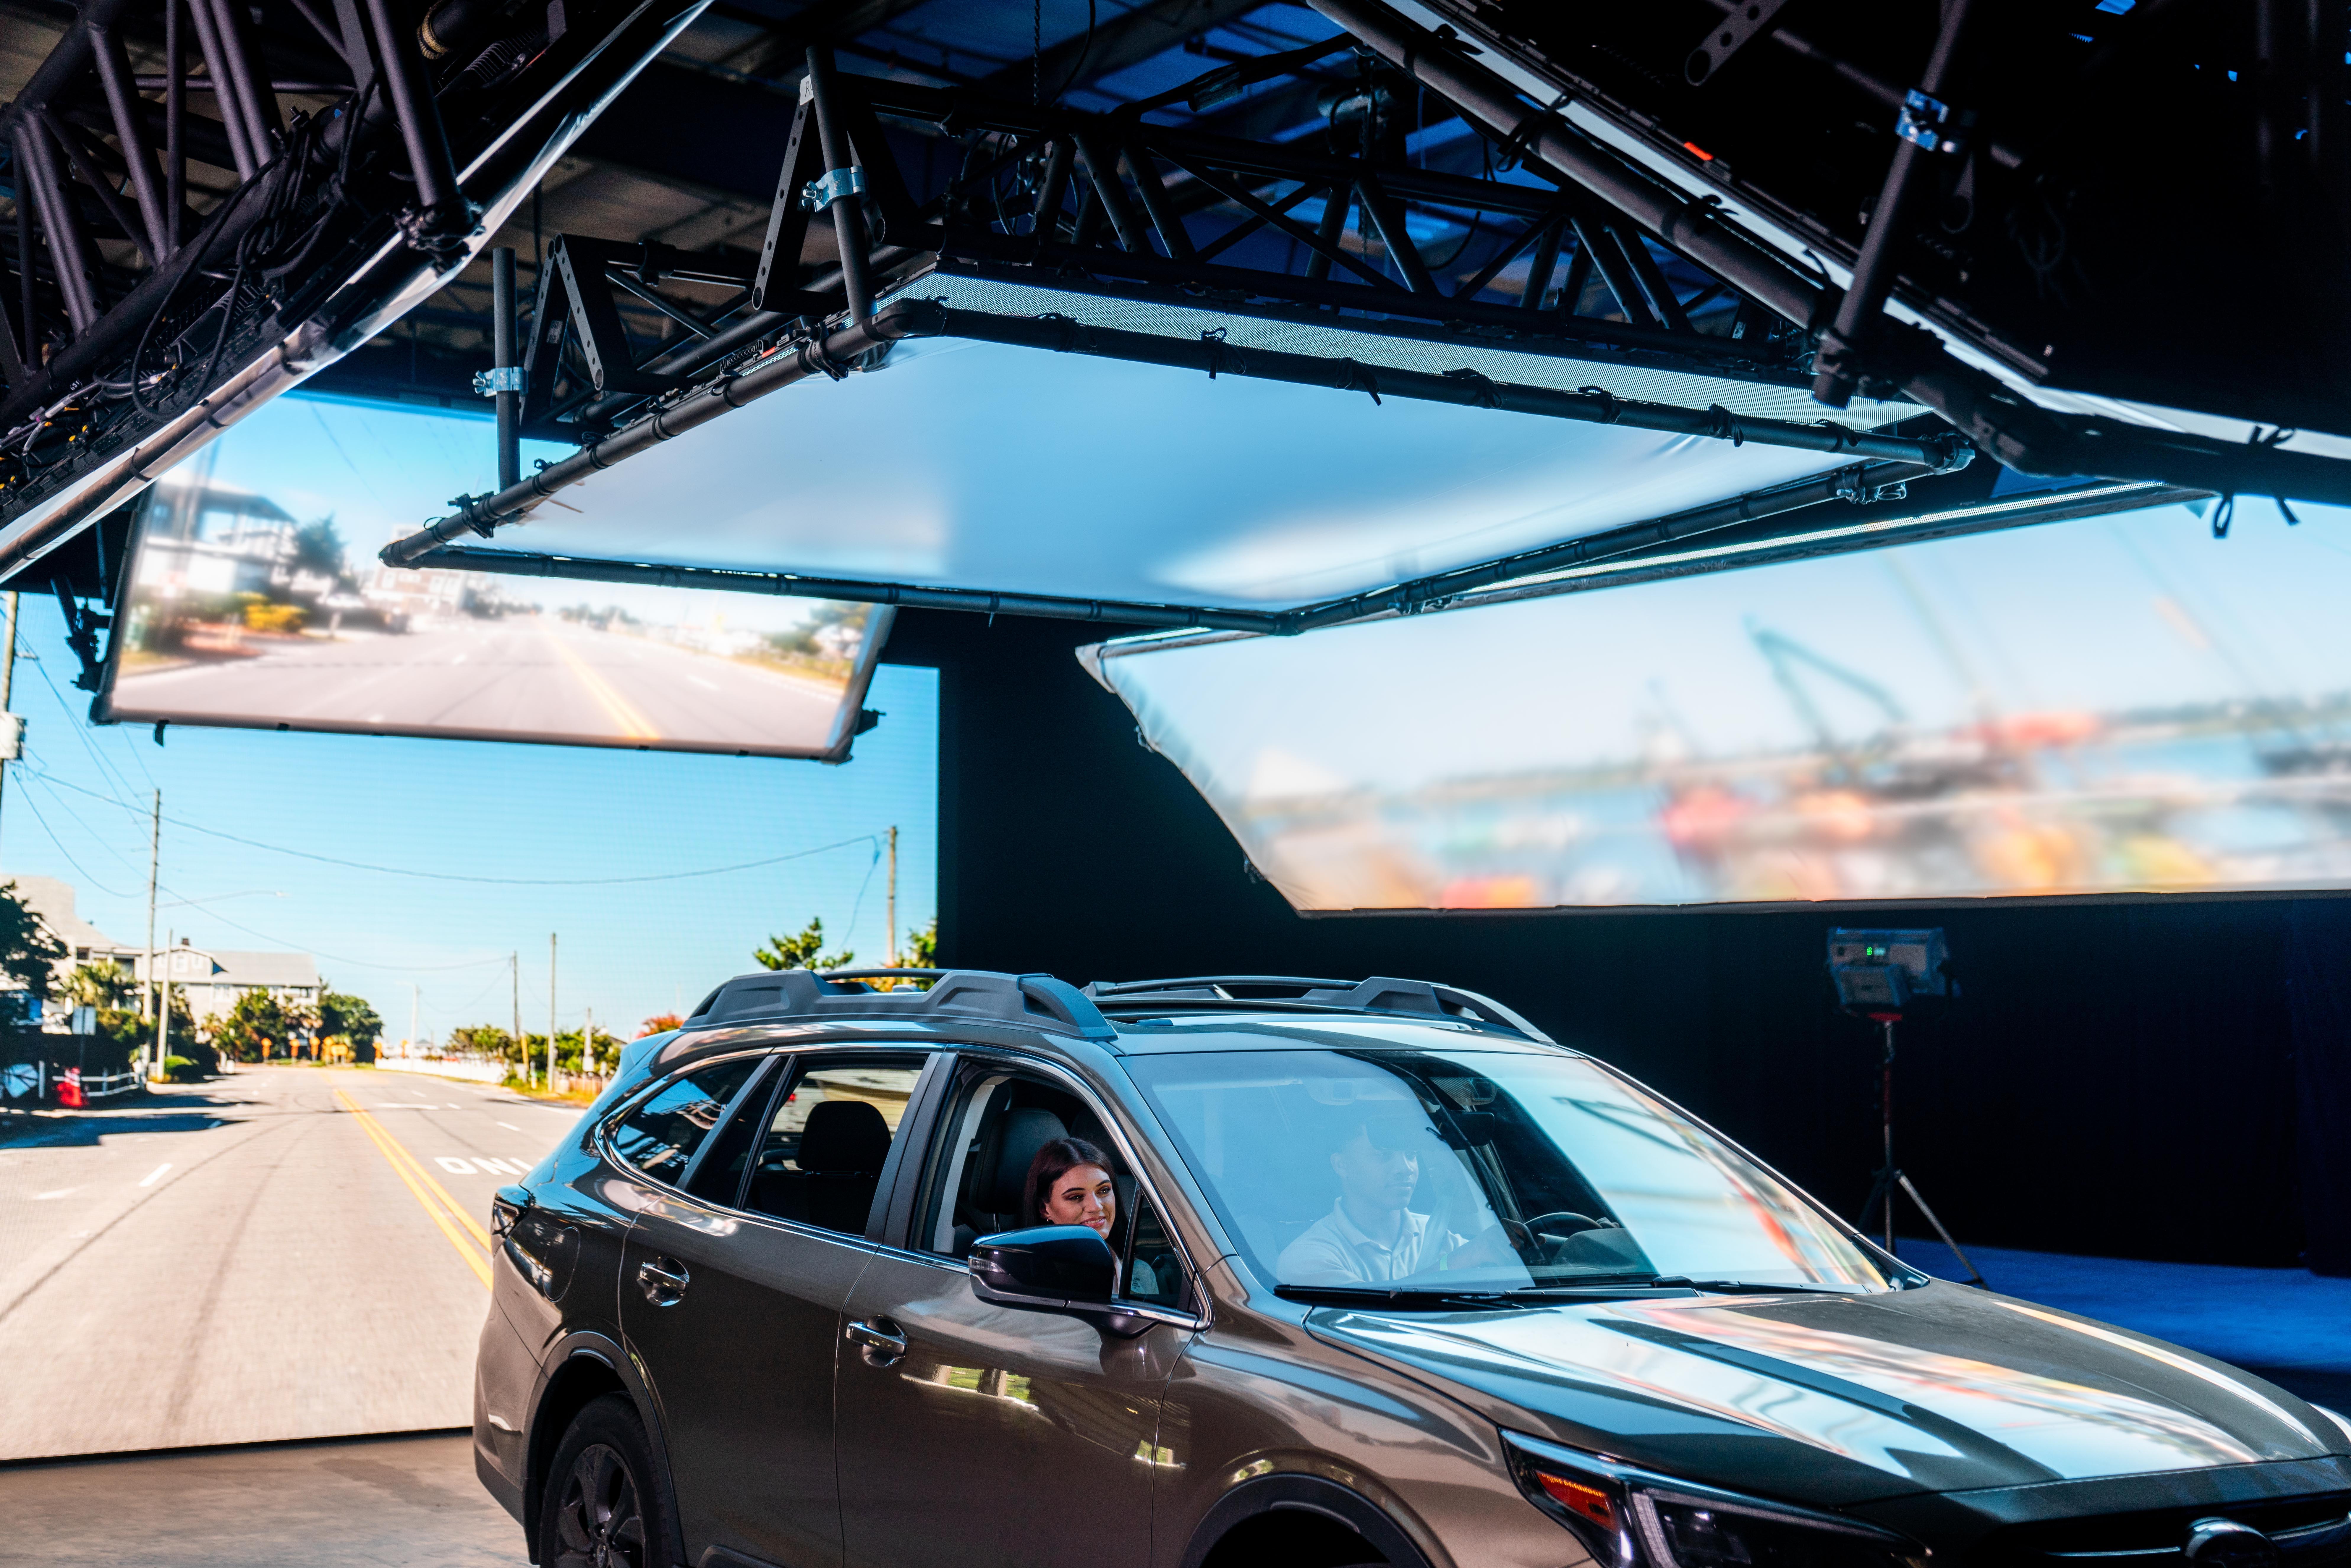 Car being filmed on movie studio set.